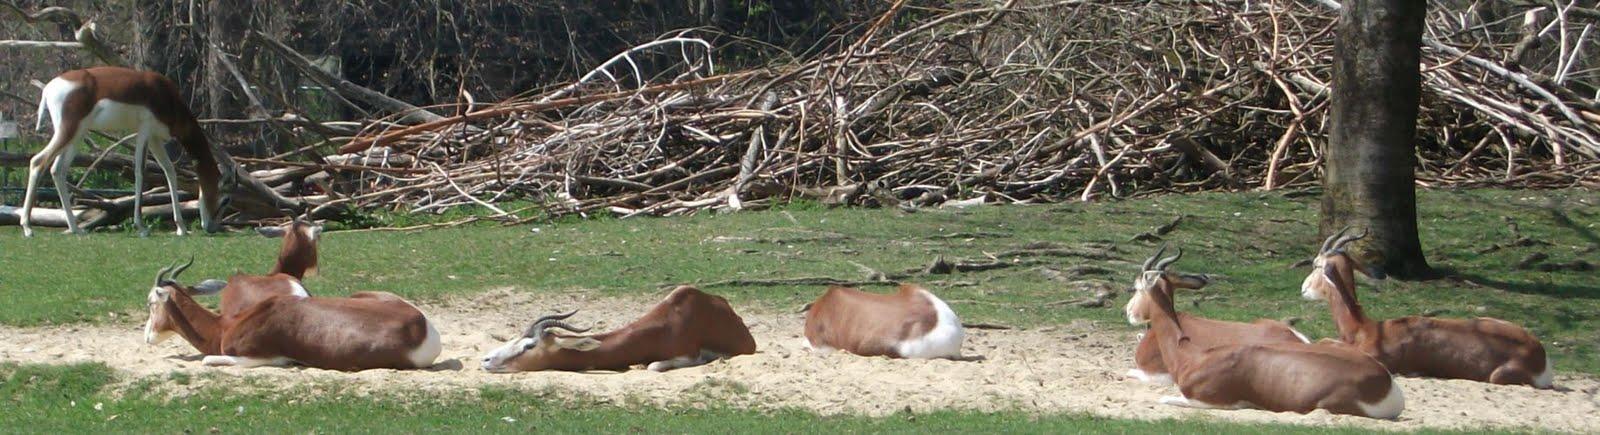 Mhorrgazelle (Tierpark Hellabrunn)